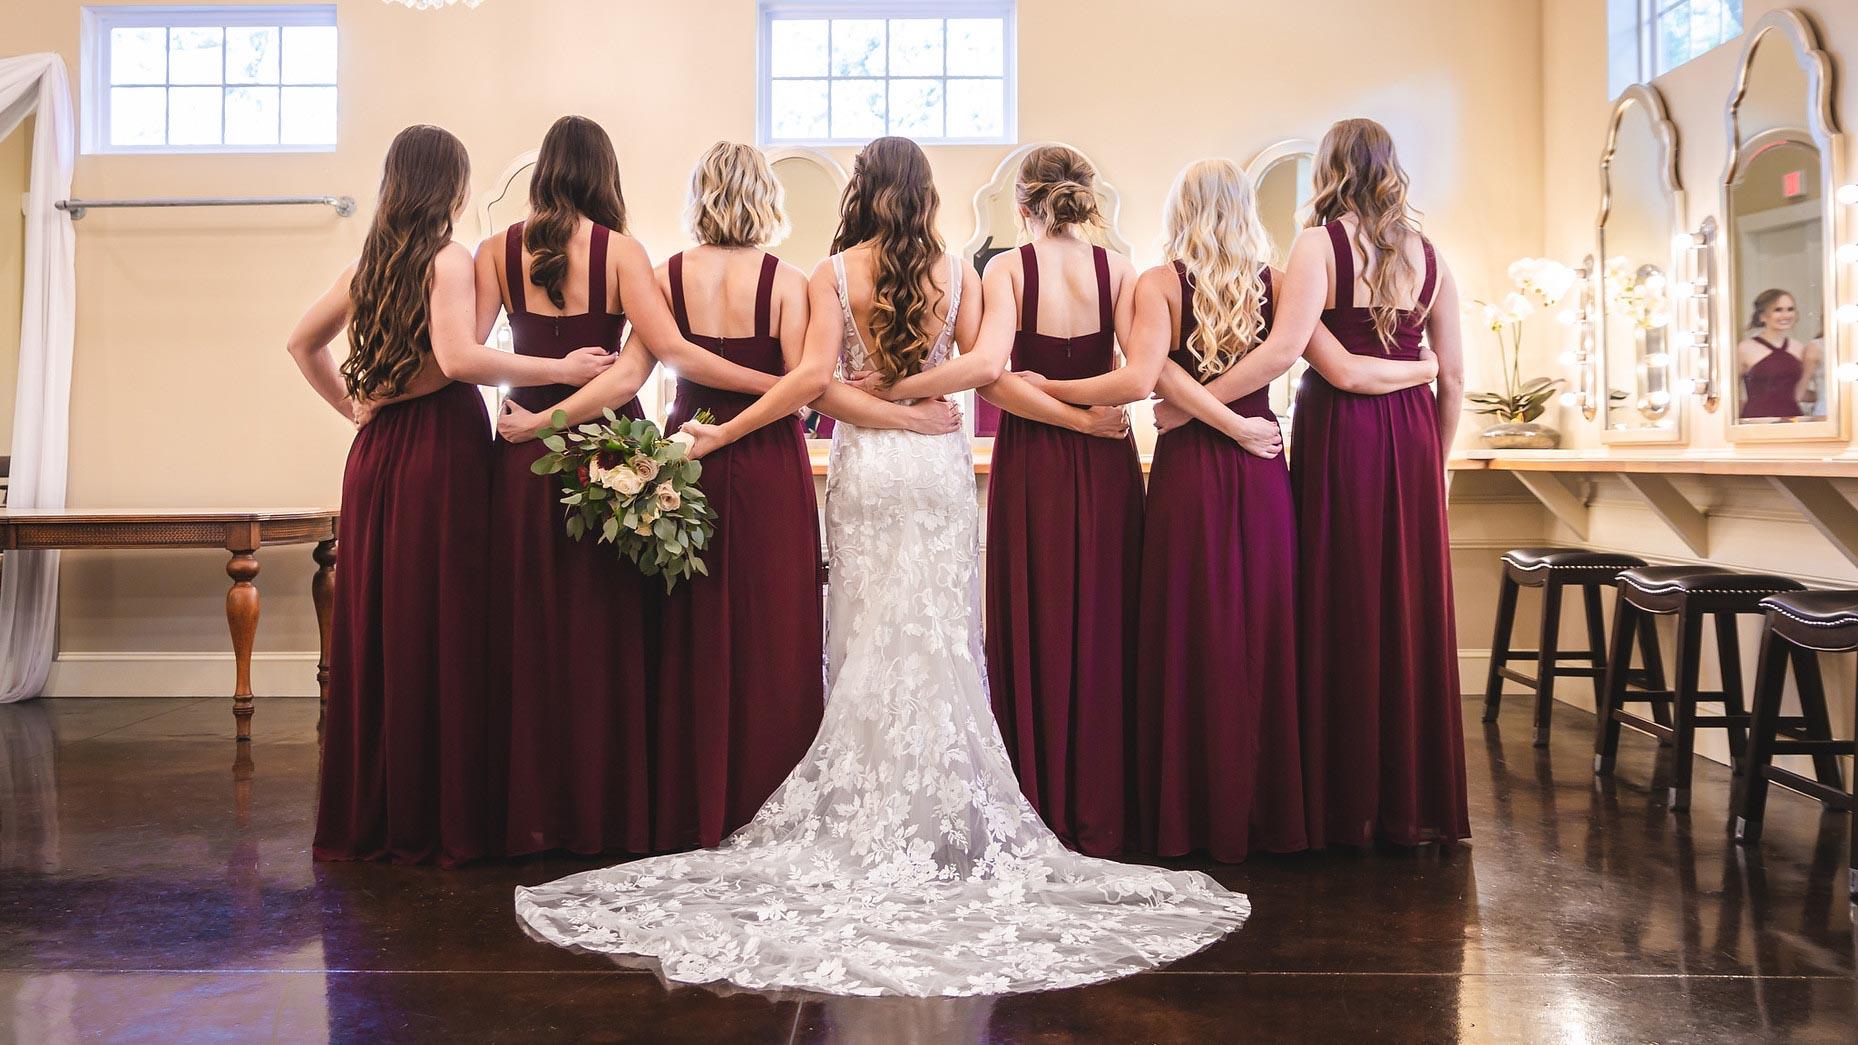 adam-szarmack-bowing-oaks-wedding-photographer-jacksonville-7.jpg